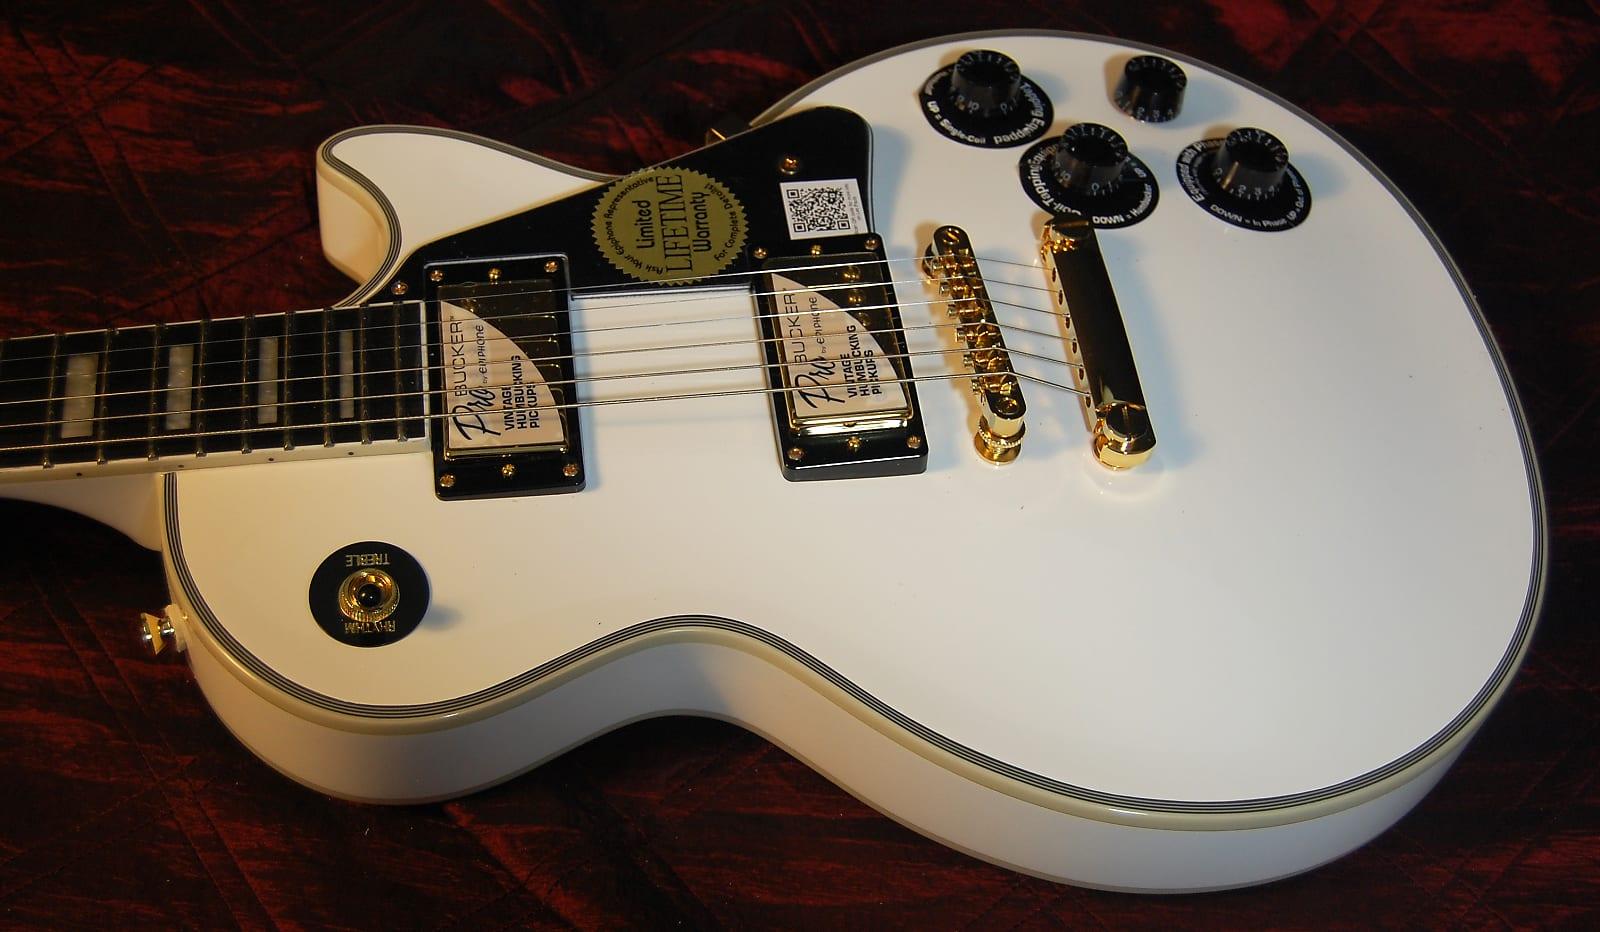 geweldige prijs 100% echt maat 40 MINTY! Epiphone Les Paul Custom Pro - Alpine White Finish - Authorized  Dealer - Save BIG!